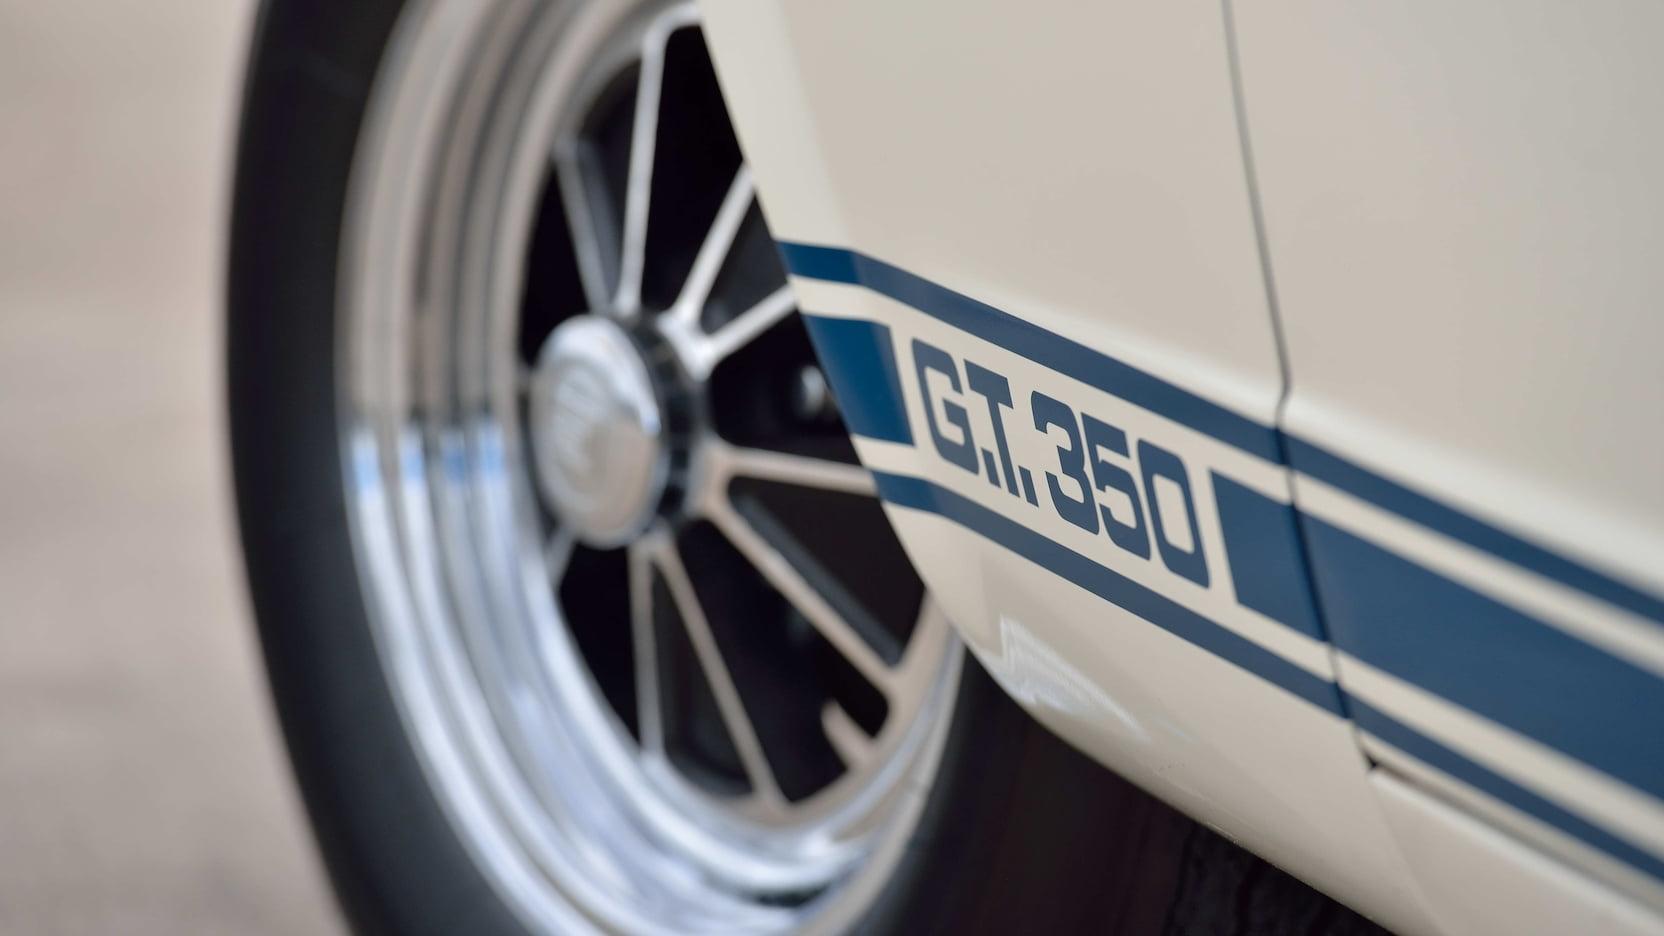 1966 Shelby GT350 logo